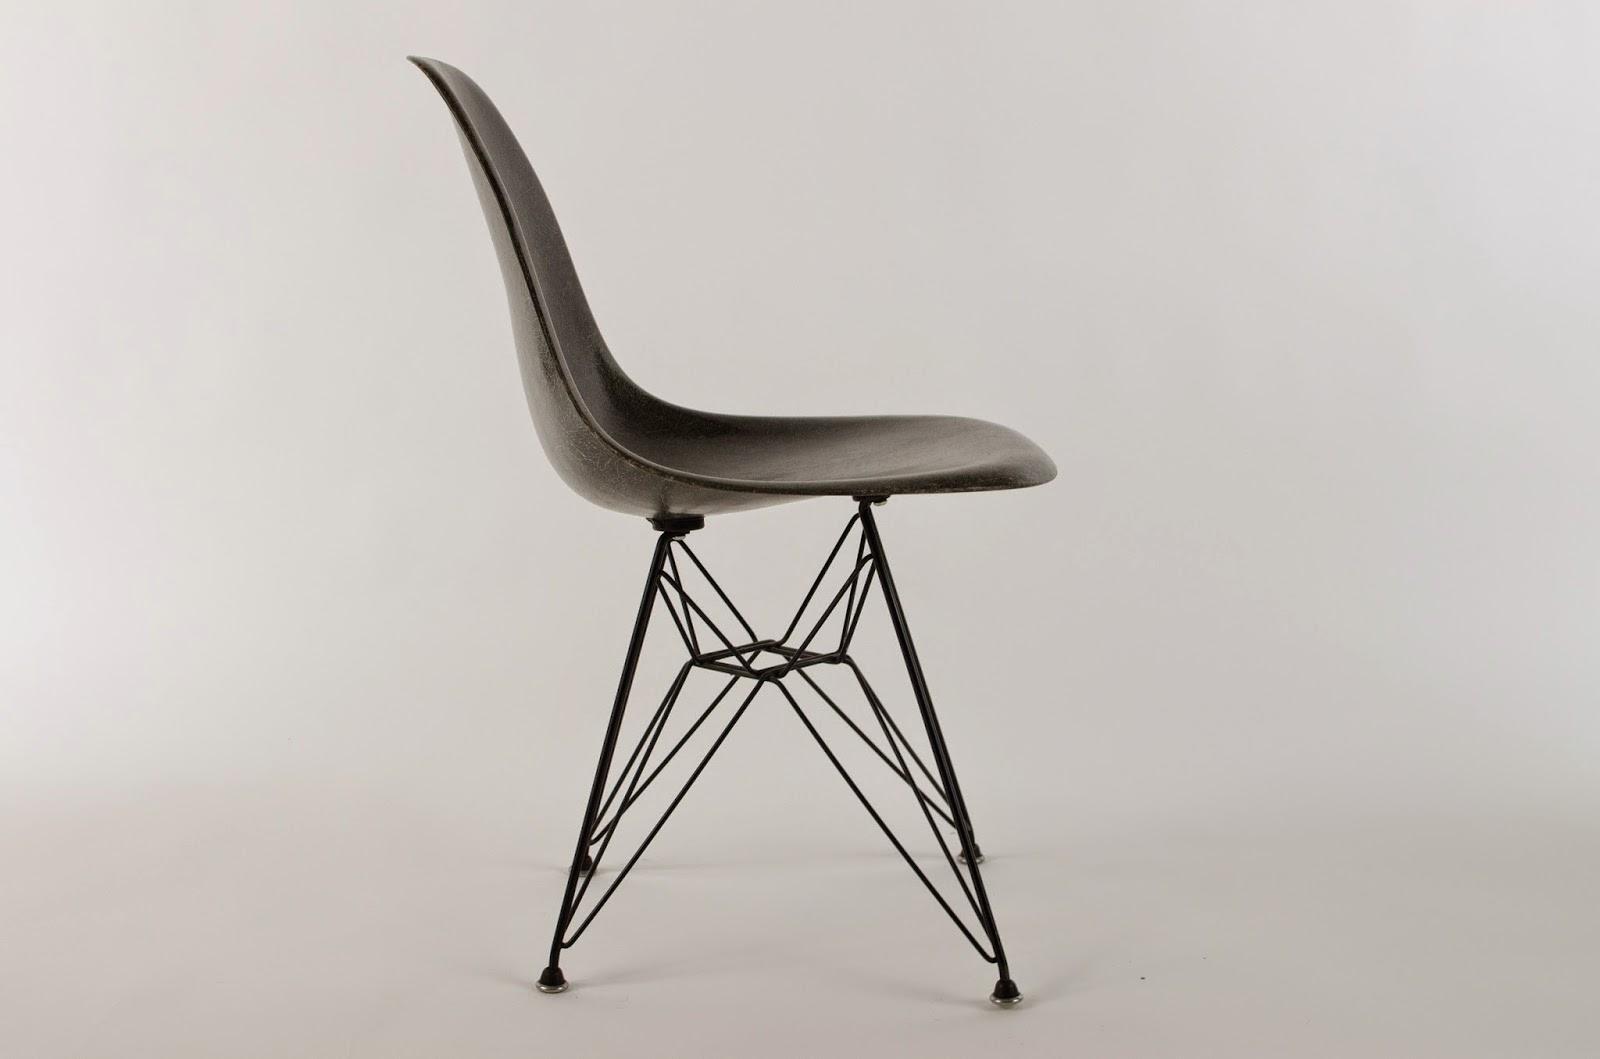 Charles amp ray eames eames dsw side chair fiberglass replica - Rare Elephant Hide Grey Fiberglass Side Chair Designed By Charles Ray Eames For Herman Miller C